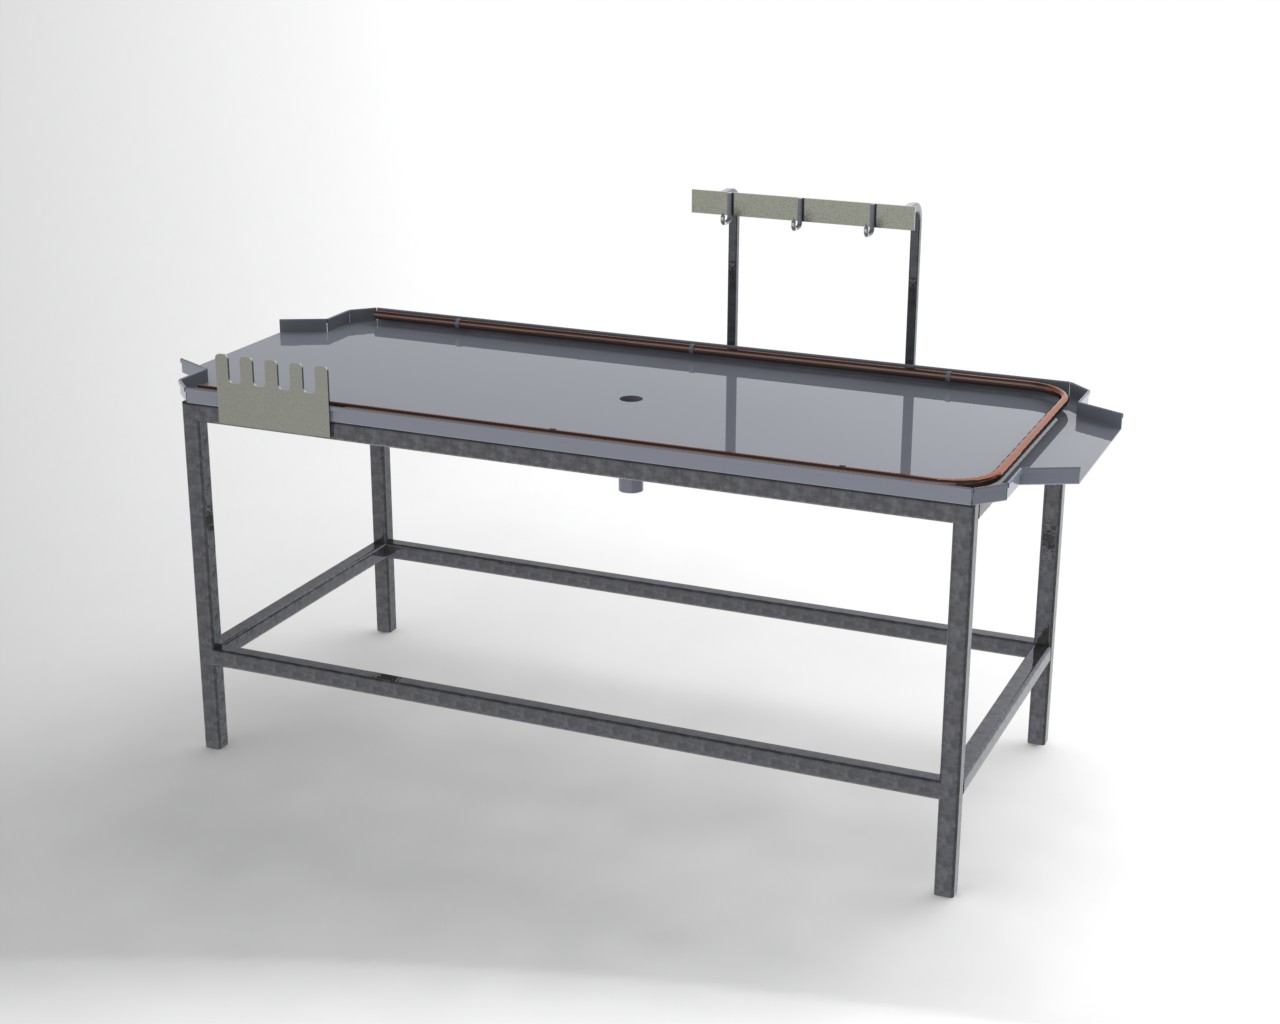 stol-priemki-i-razborki-kishkomplekta